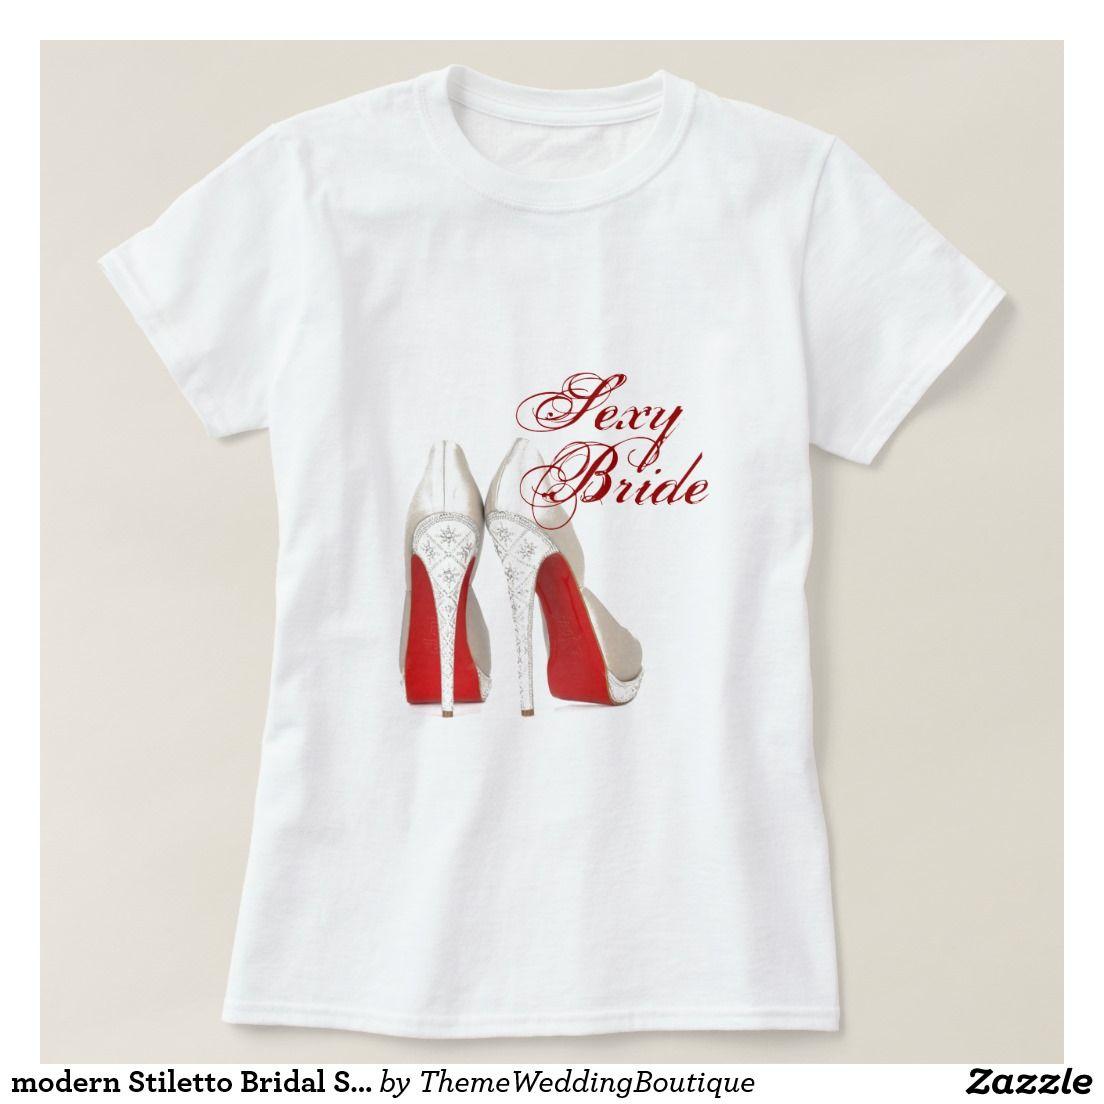 modern Stiletto Bridal Shower bachelorette party T-Shirt